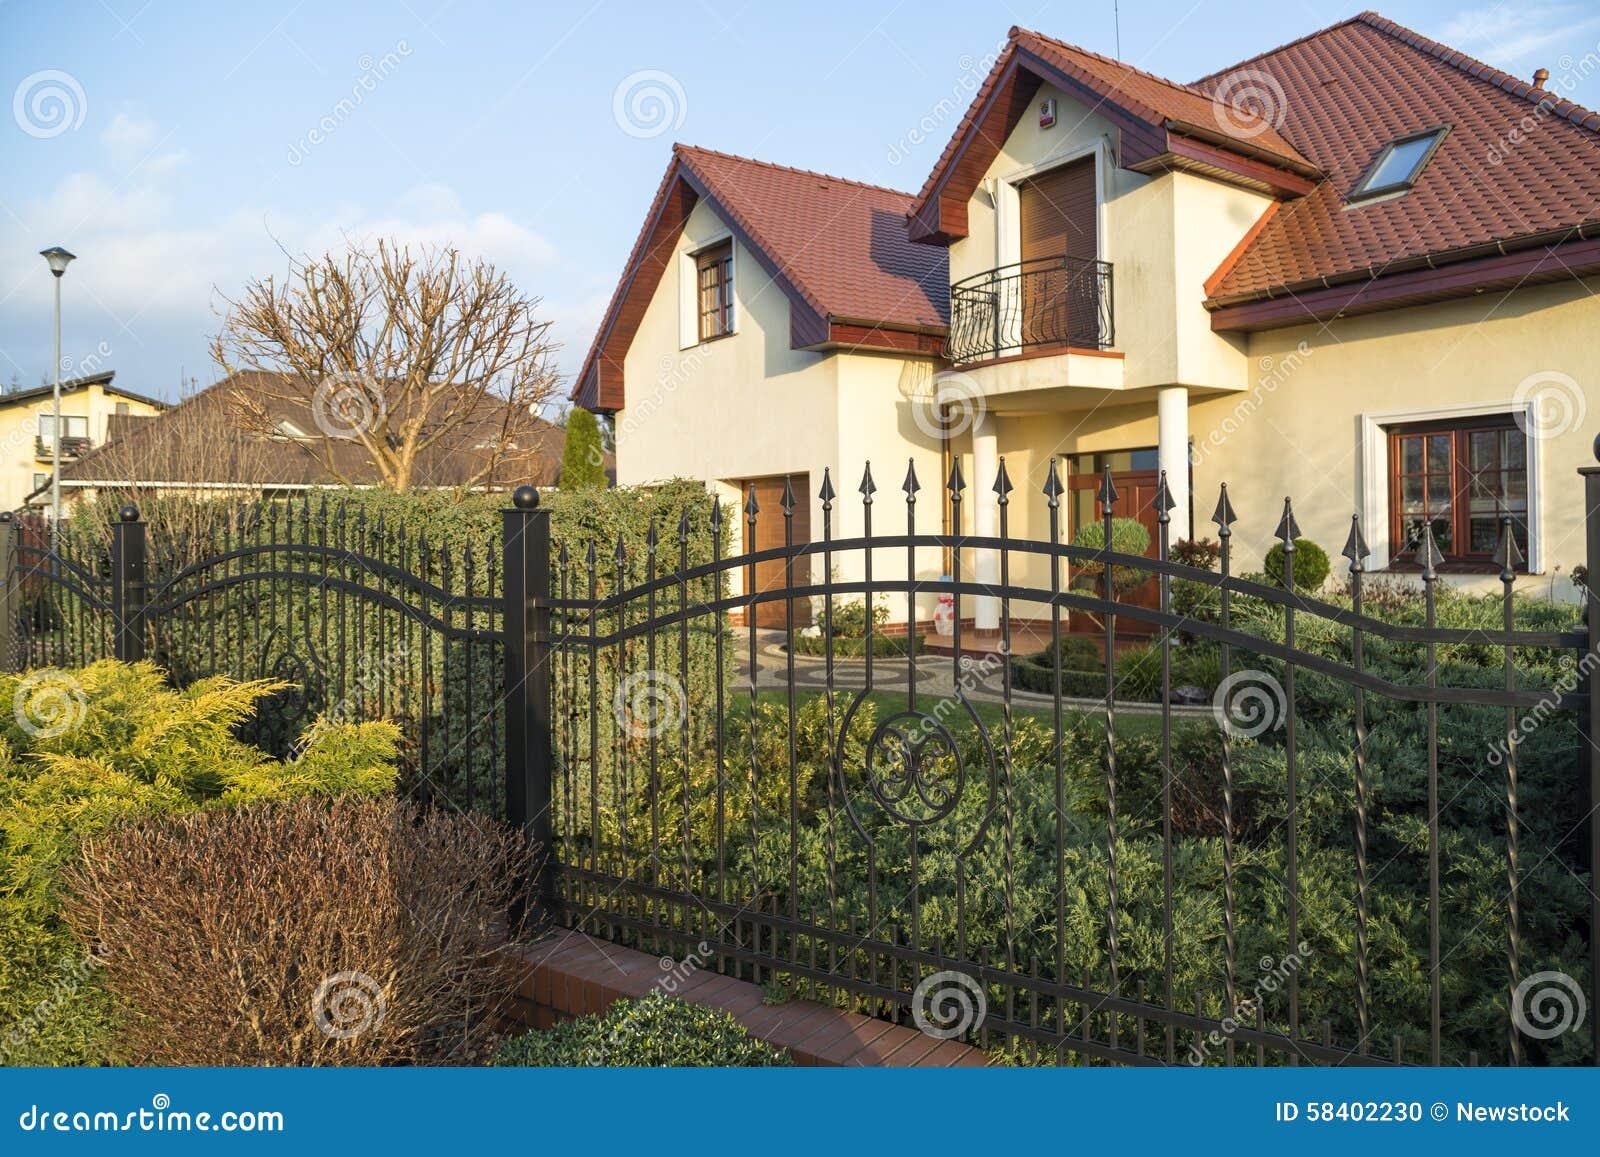 Petit jardin moderne photo stock. Image du construction - 58402230